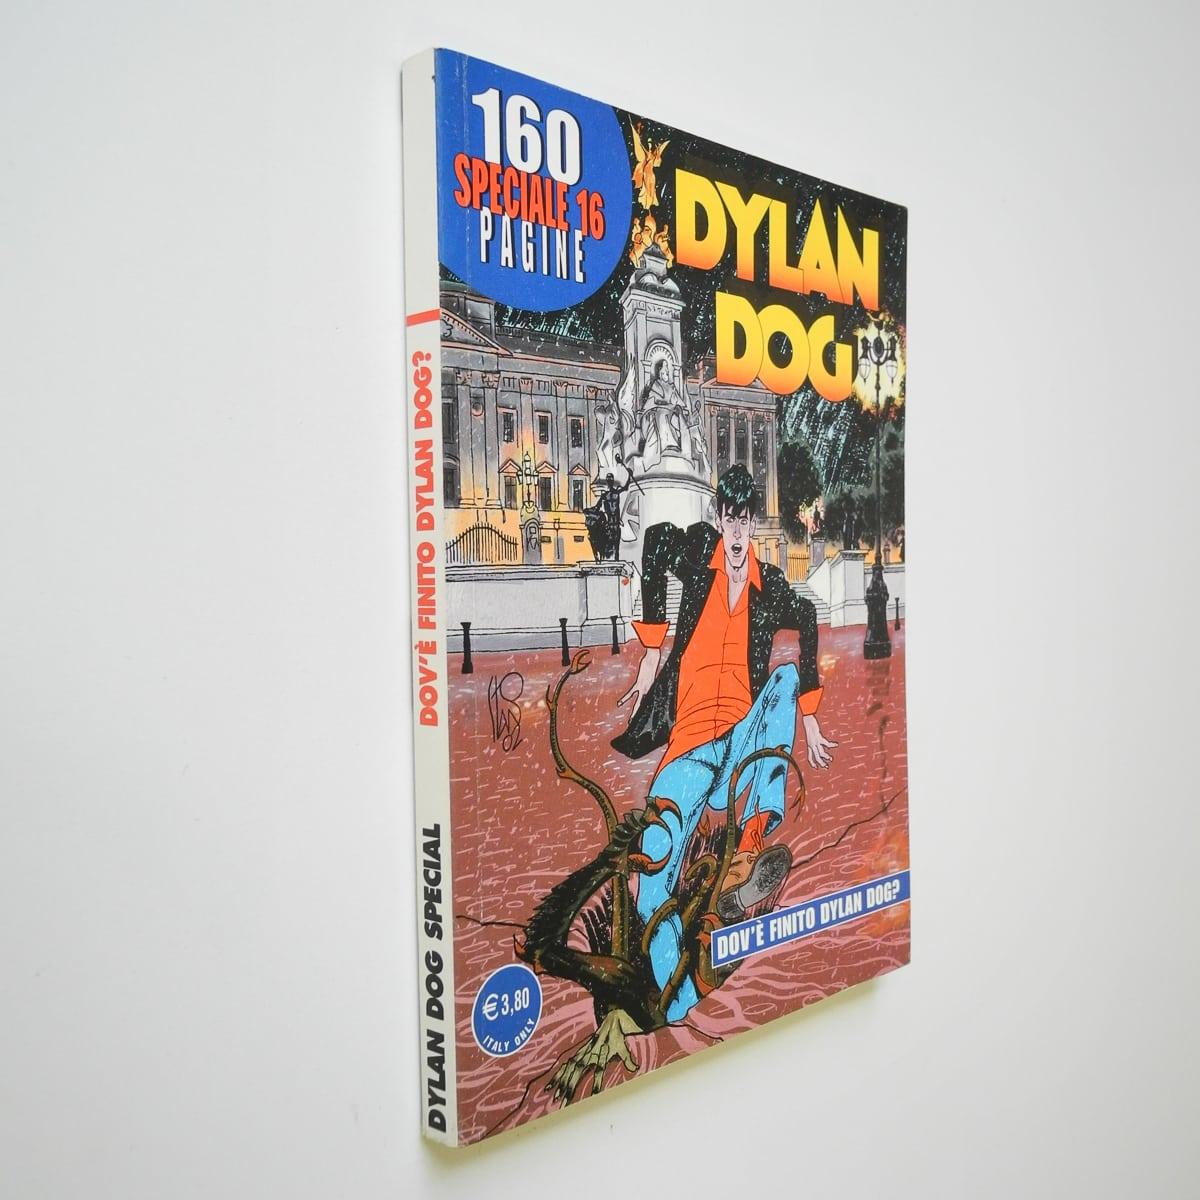 Dylan Dog speciale n. 16 Bonelli